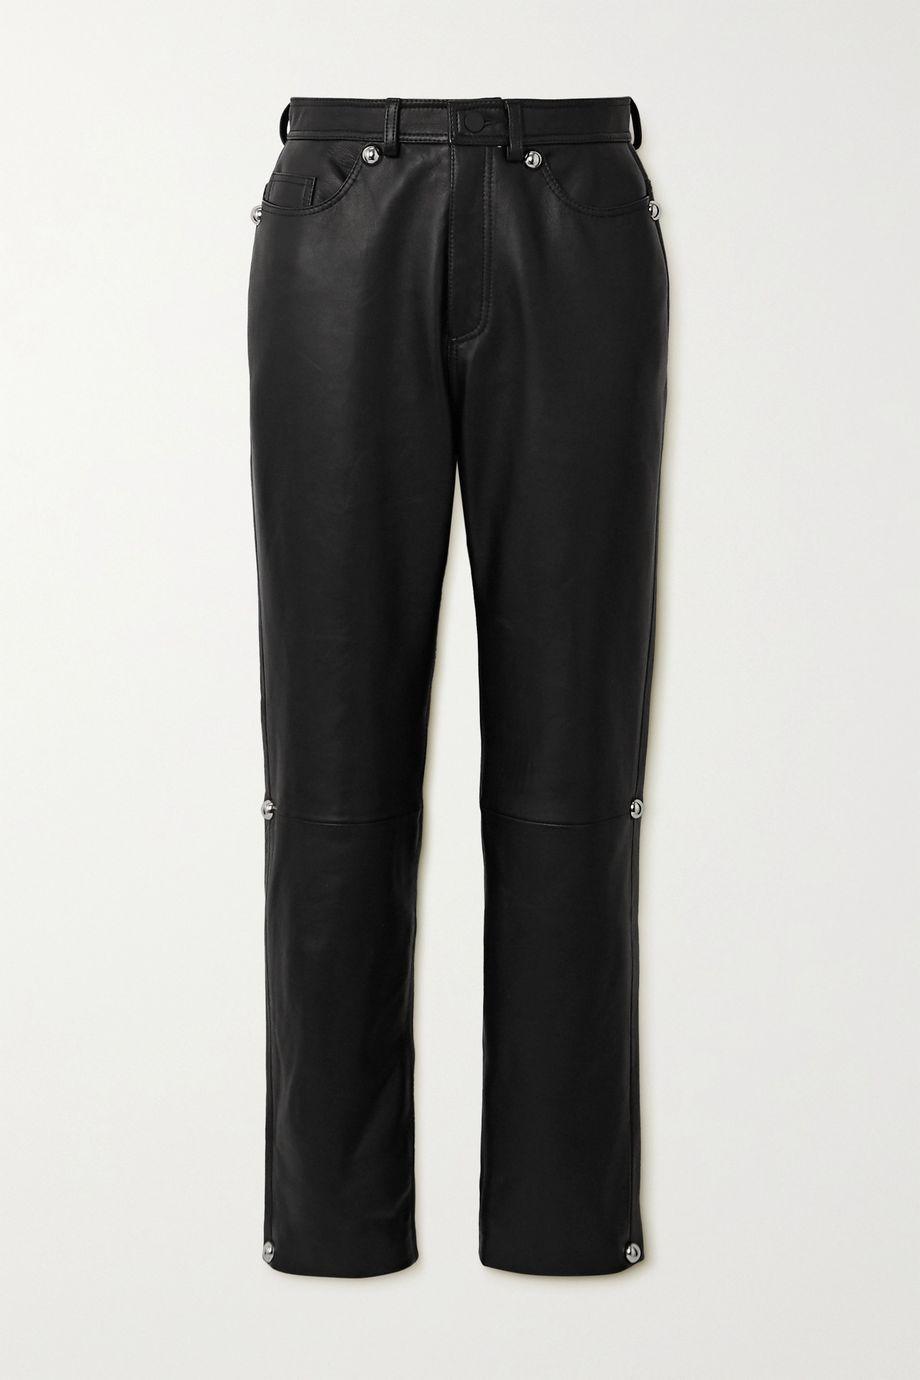 Christopher Kane Dome leather straight-leg pants